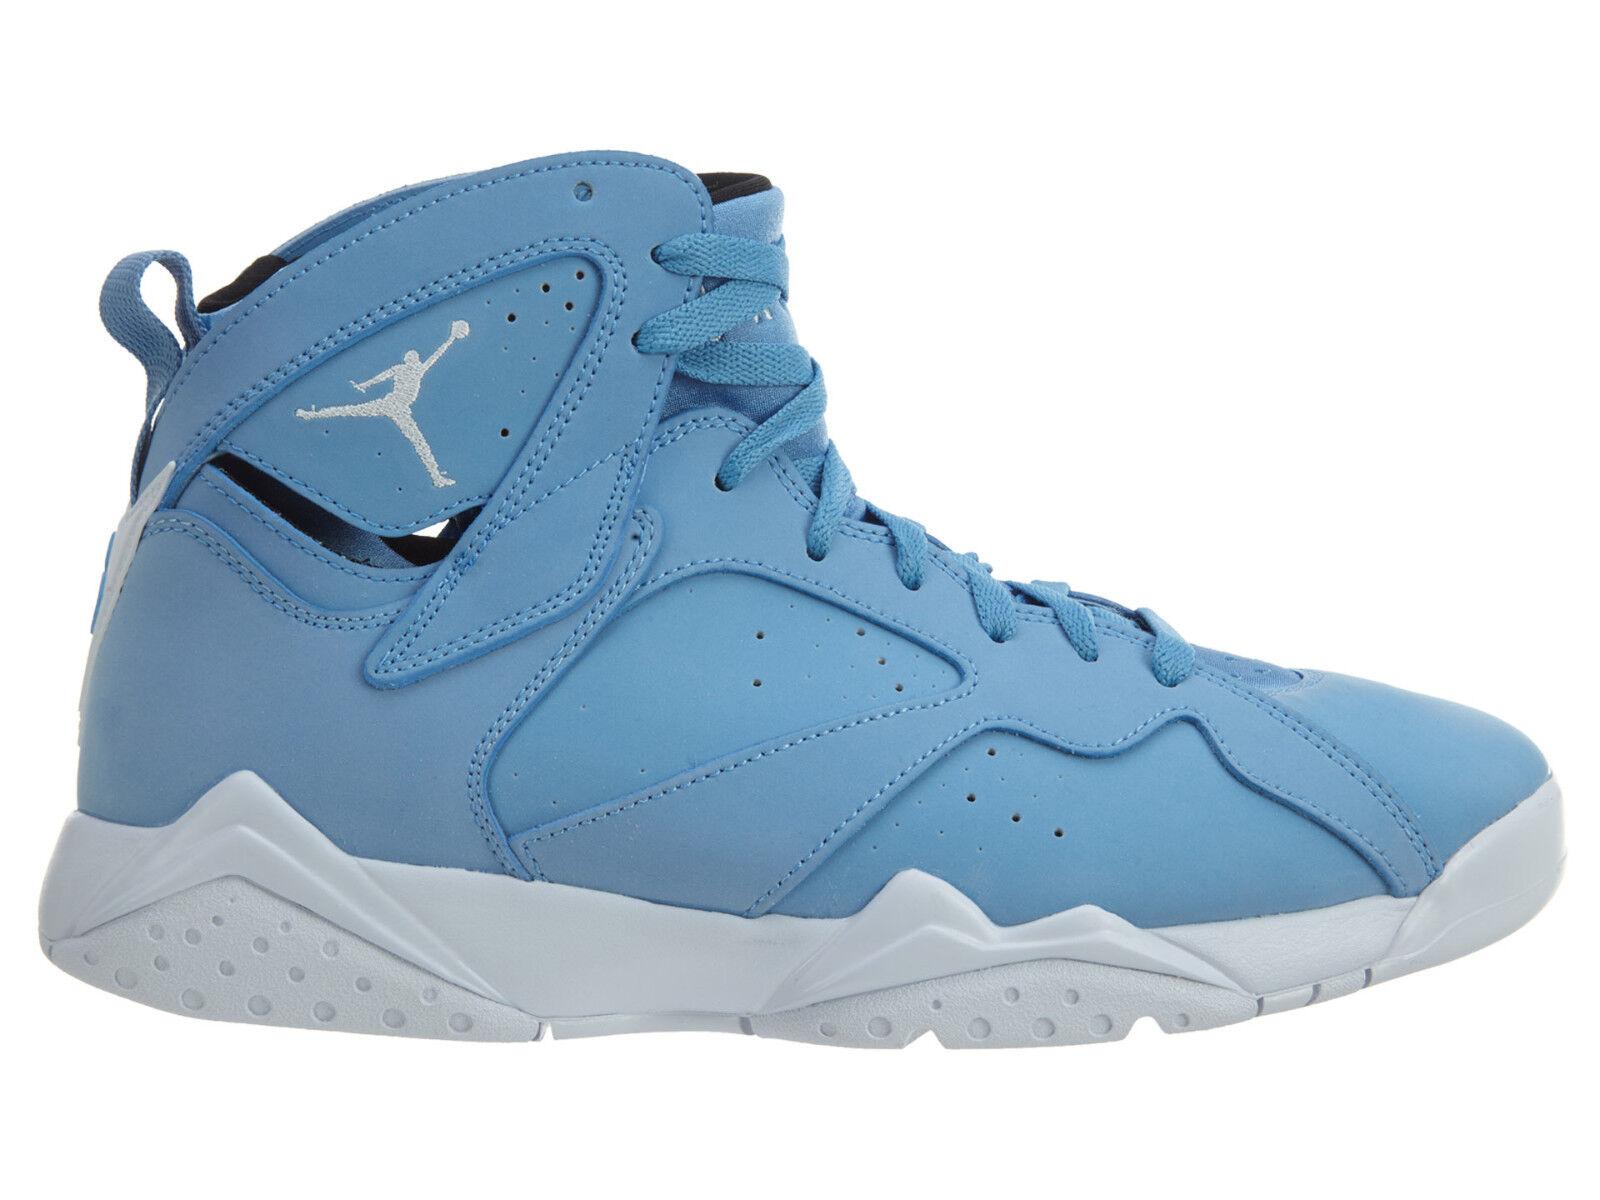 Air Jordan 7 VII Retro Pantone Mens 304775-400 University Blue Shoes Size 9